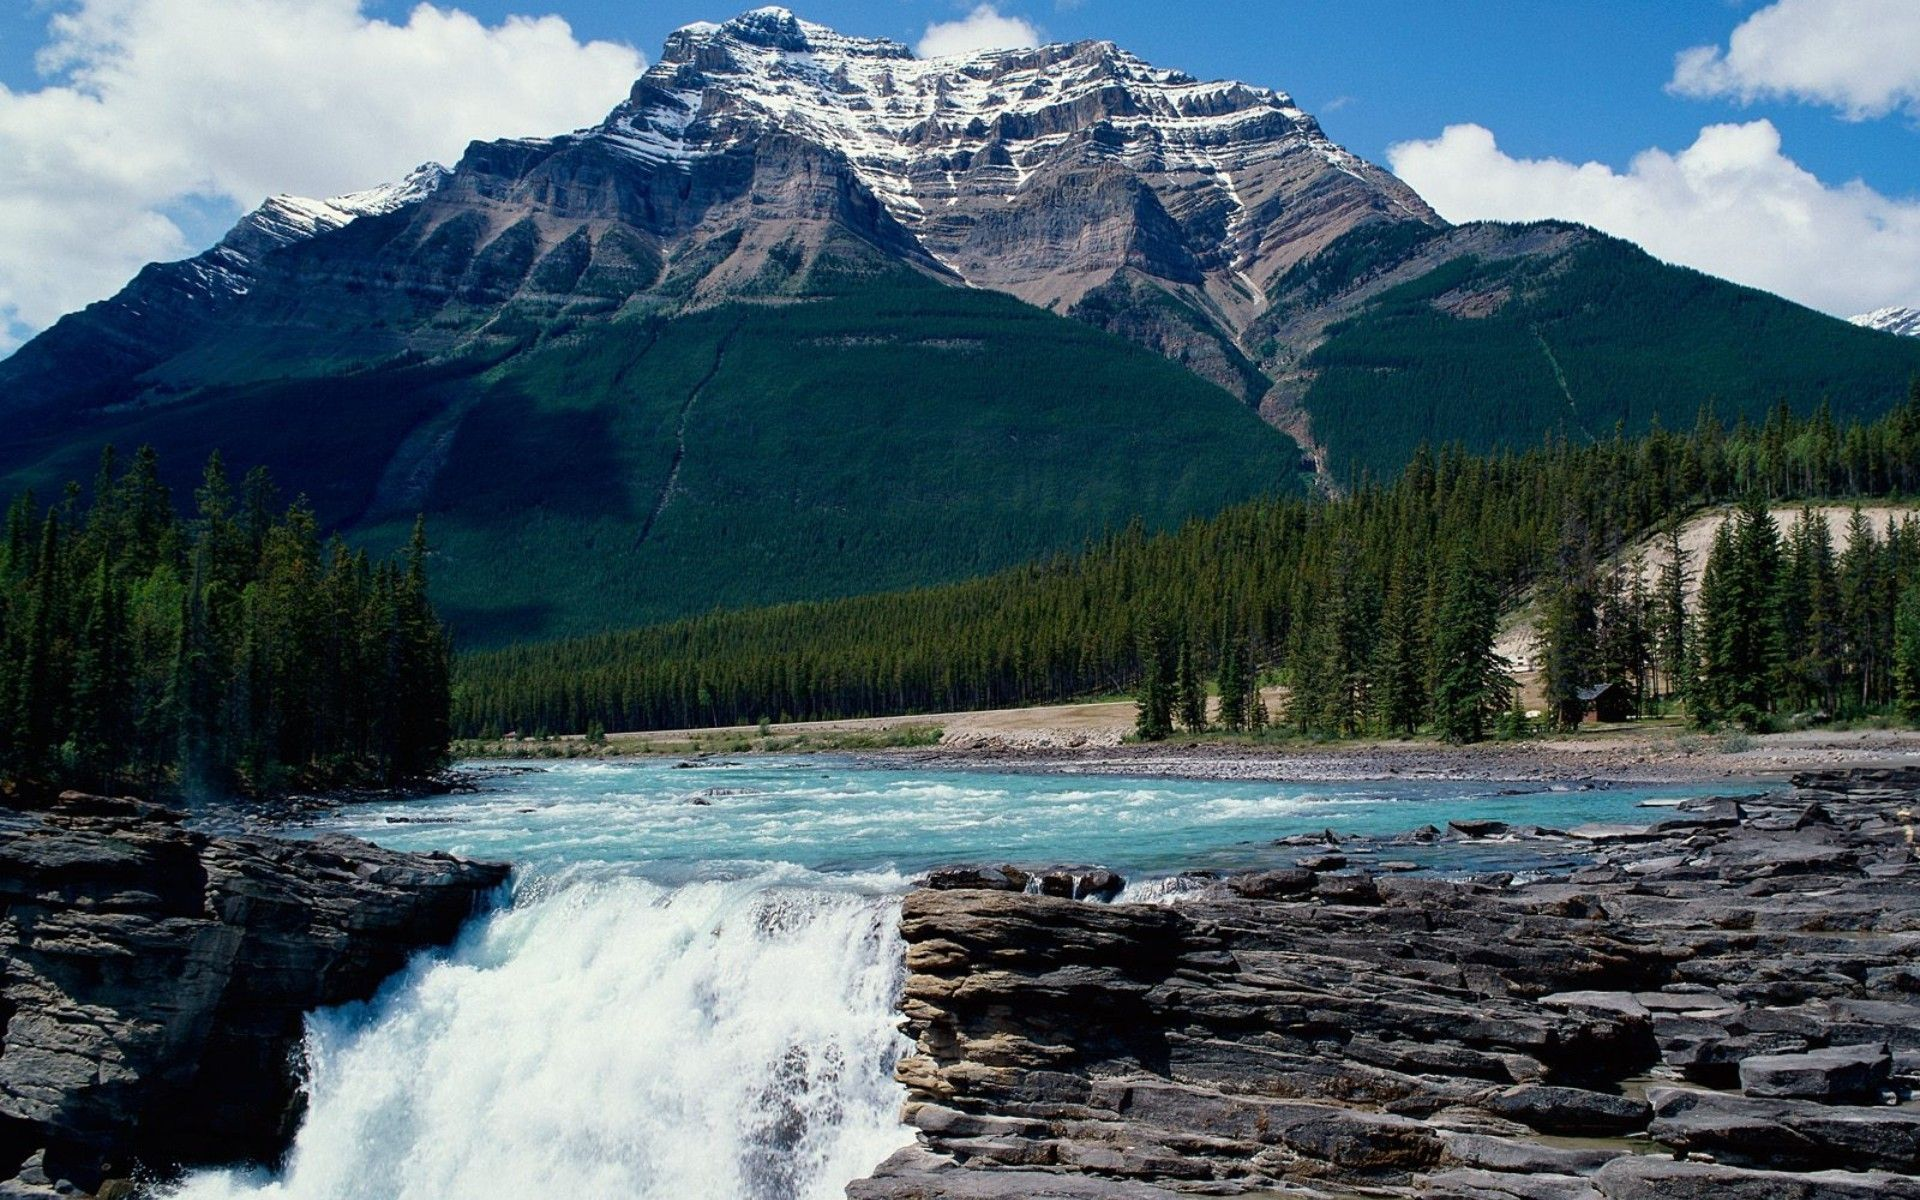 Jasper National Park Wallpaper Canada National Parks Places To Visit Jasper National Park Canada